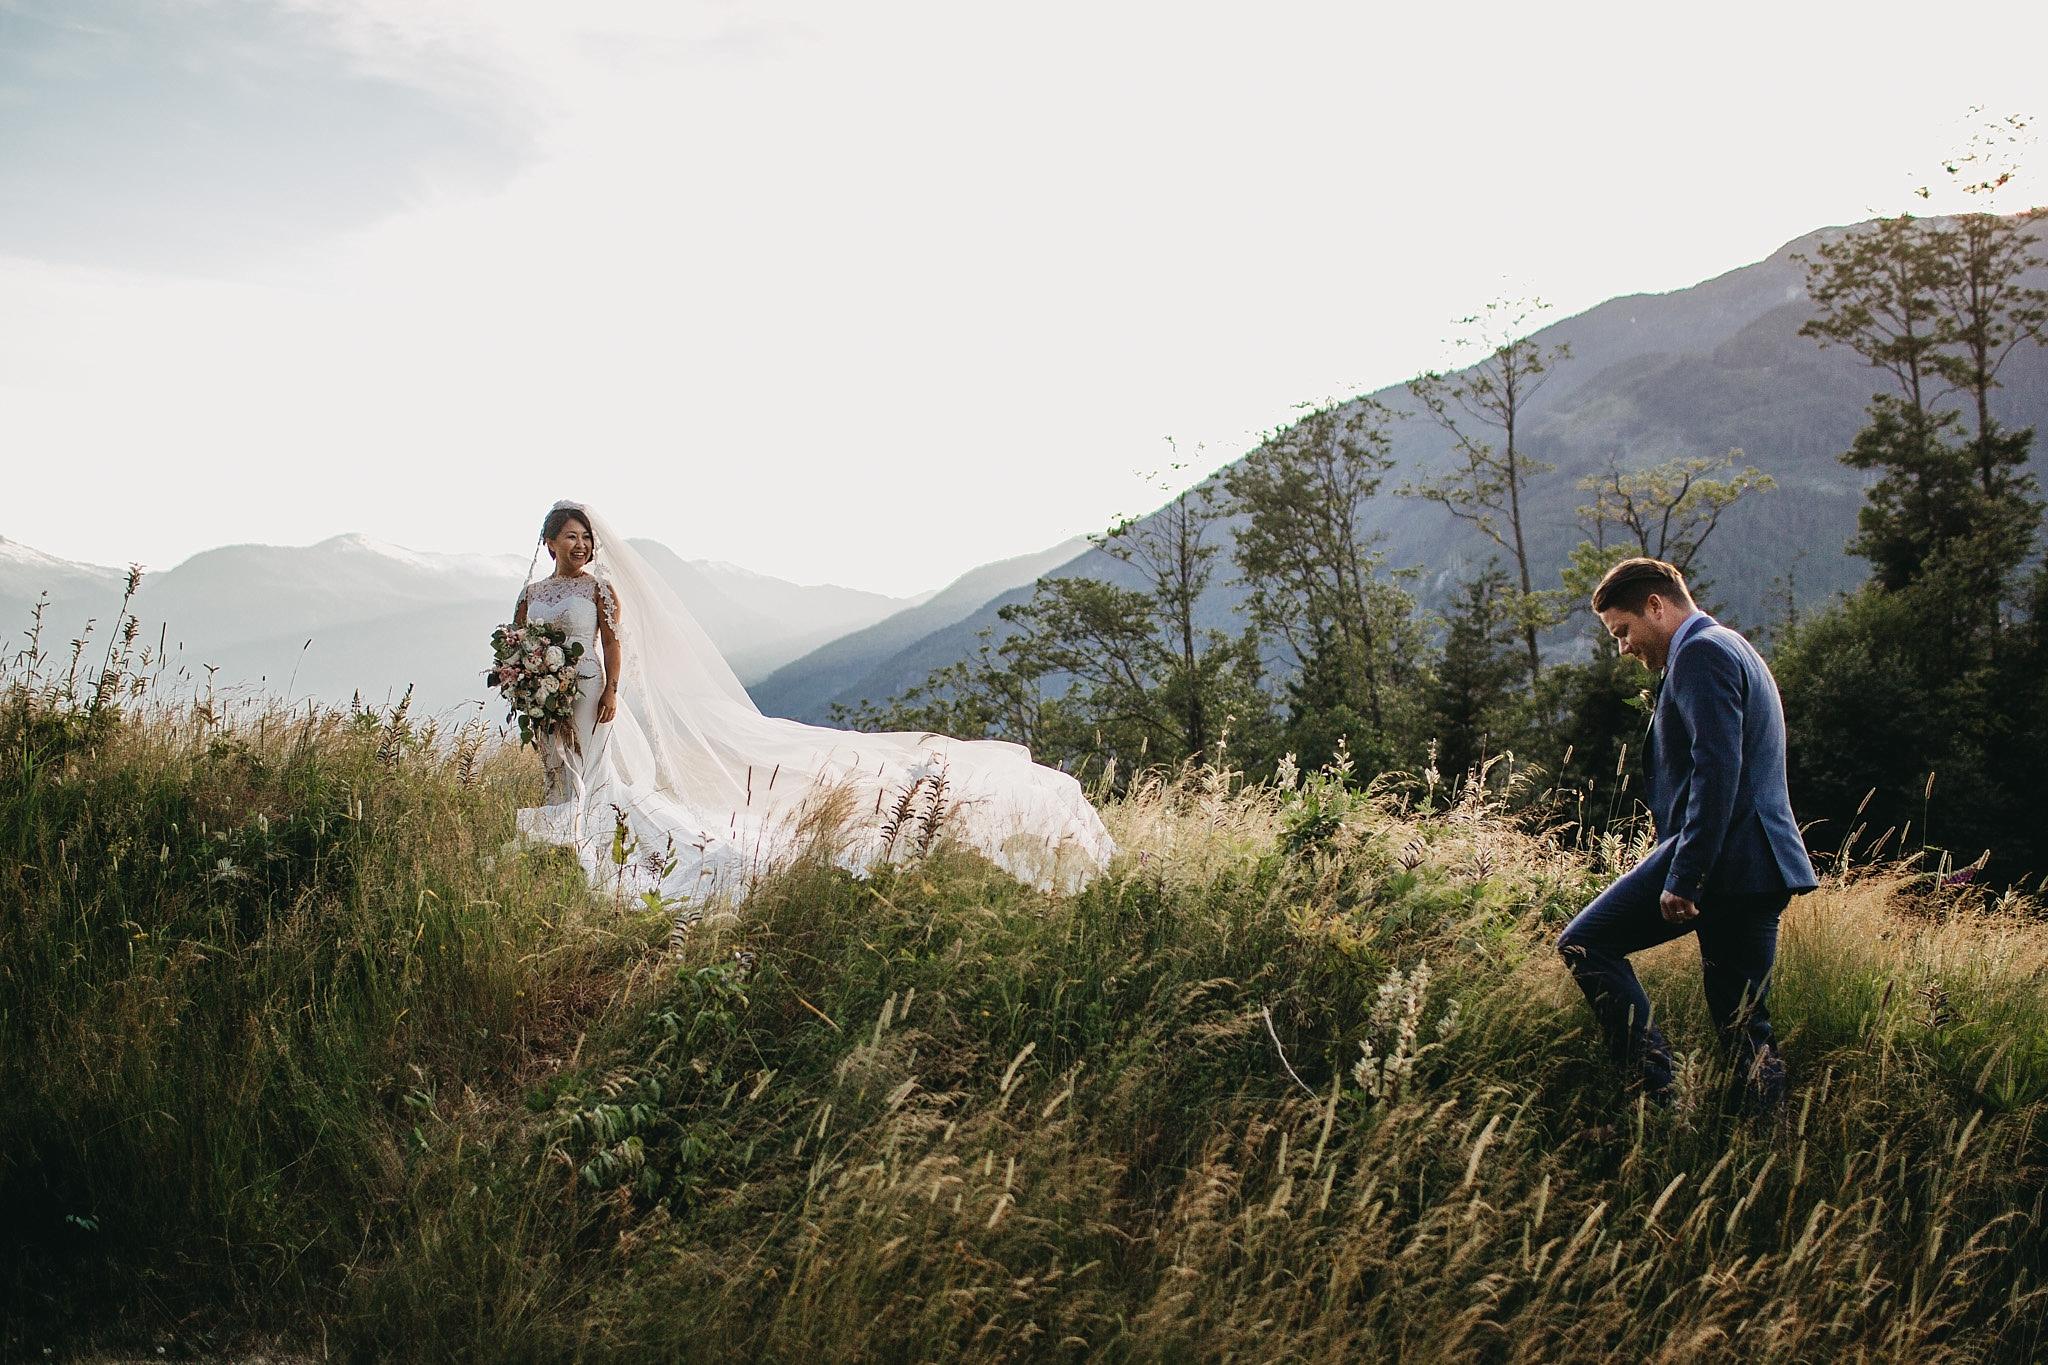 aileen-choi-photo-hart-house-wedding_0097.jpg